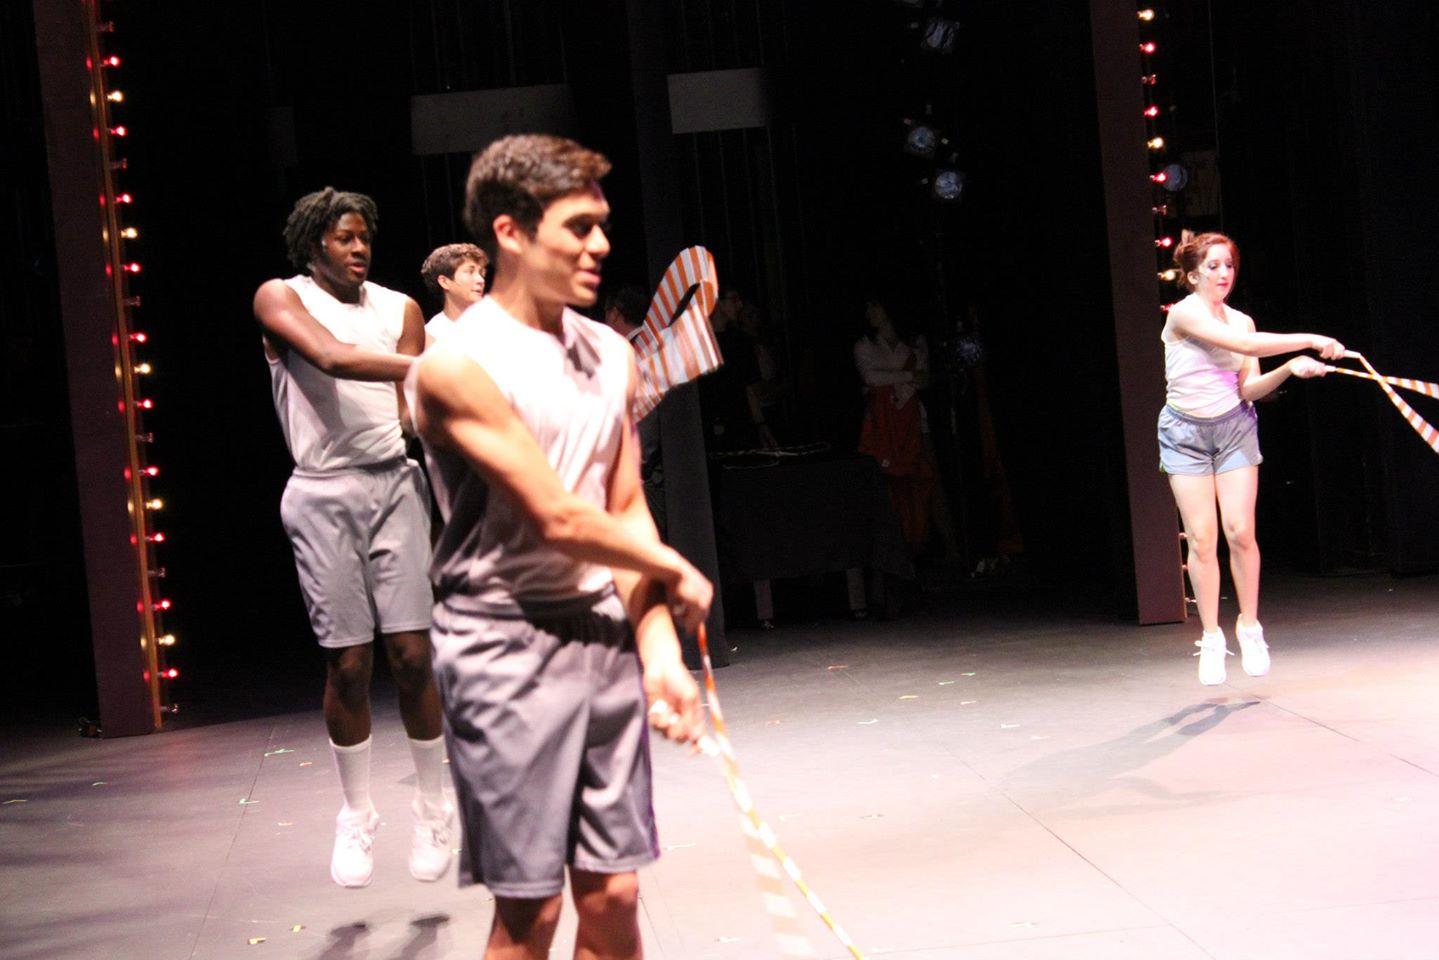 'Legally Blonde The Musical.' Cameron A. Jones, Josh Hedeby, Nick Fernandez, Carly Grossman. (Photo by Cody Cunningham)